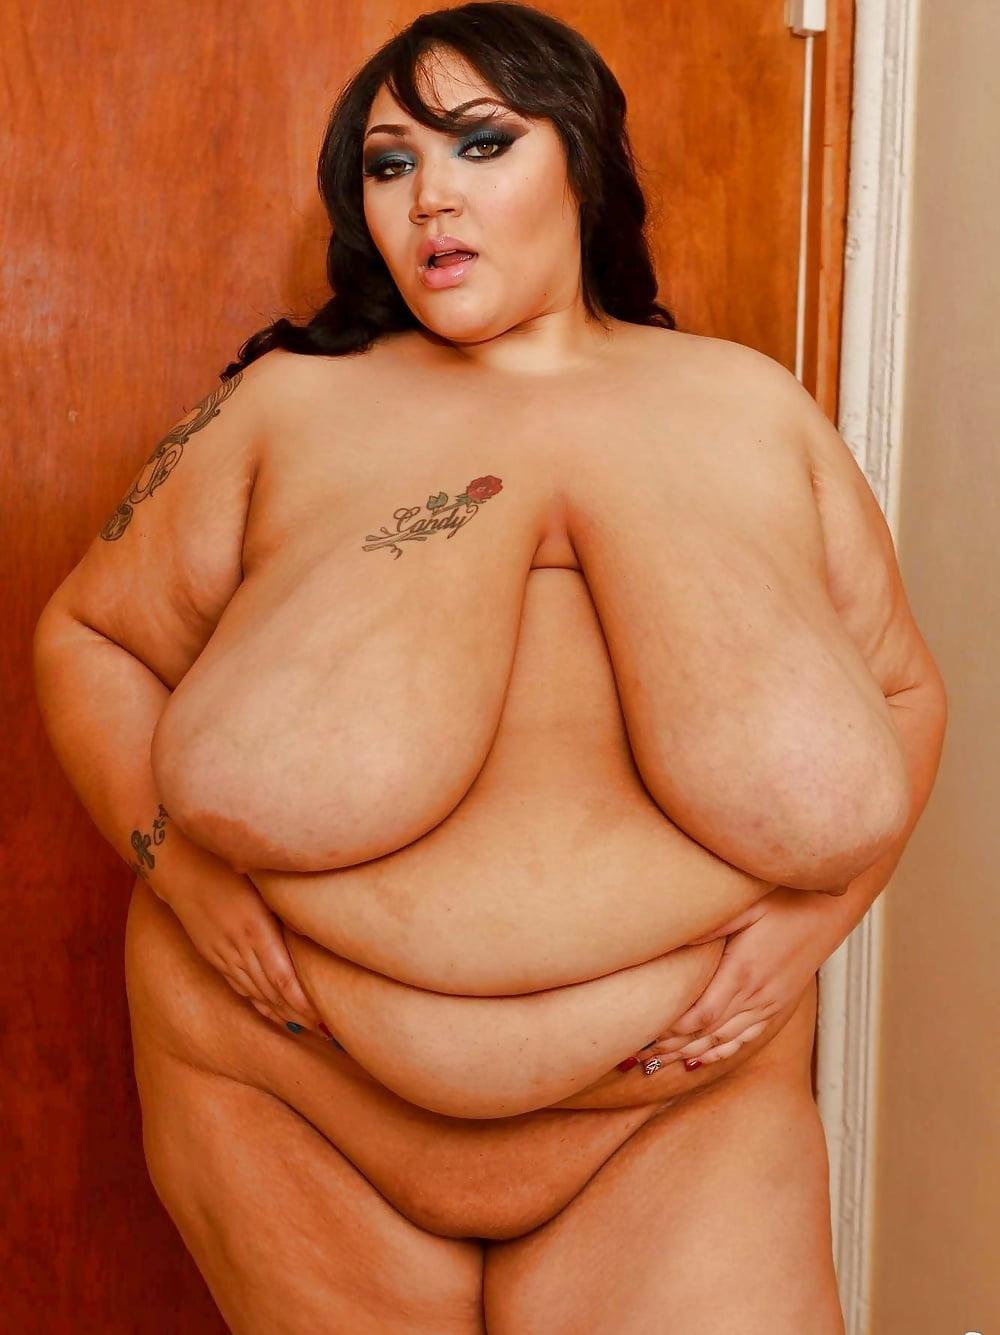 Lorelai givemore latina ssbbw amp cj wright - 2 part 6